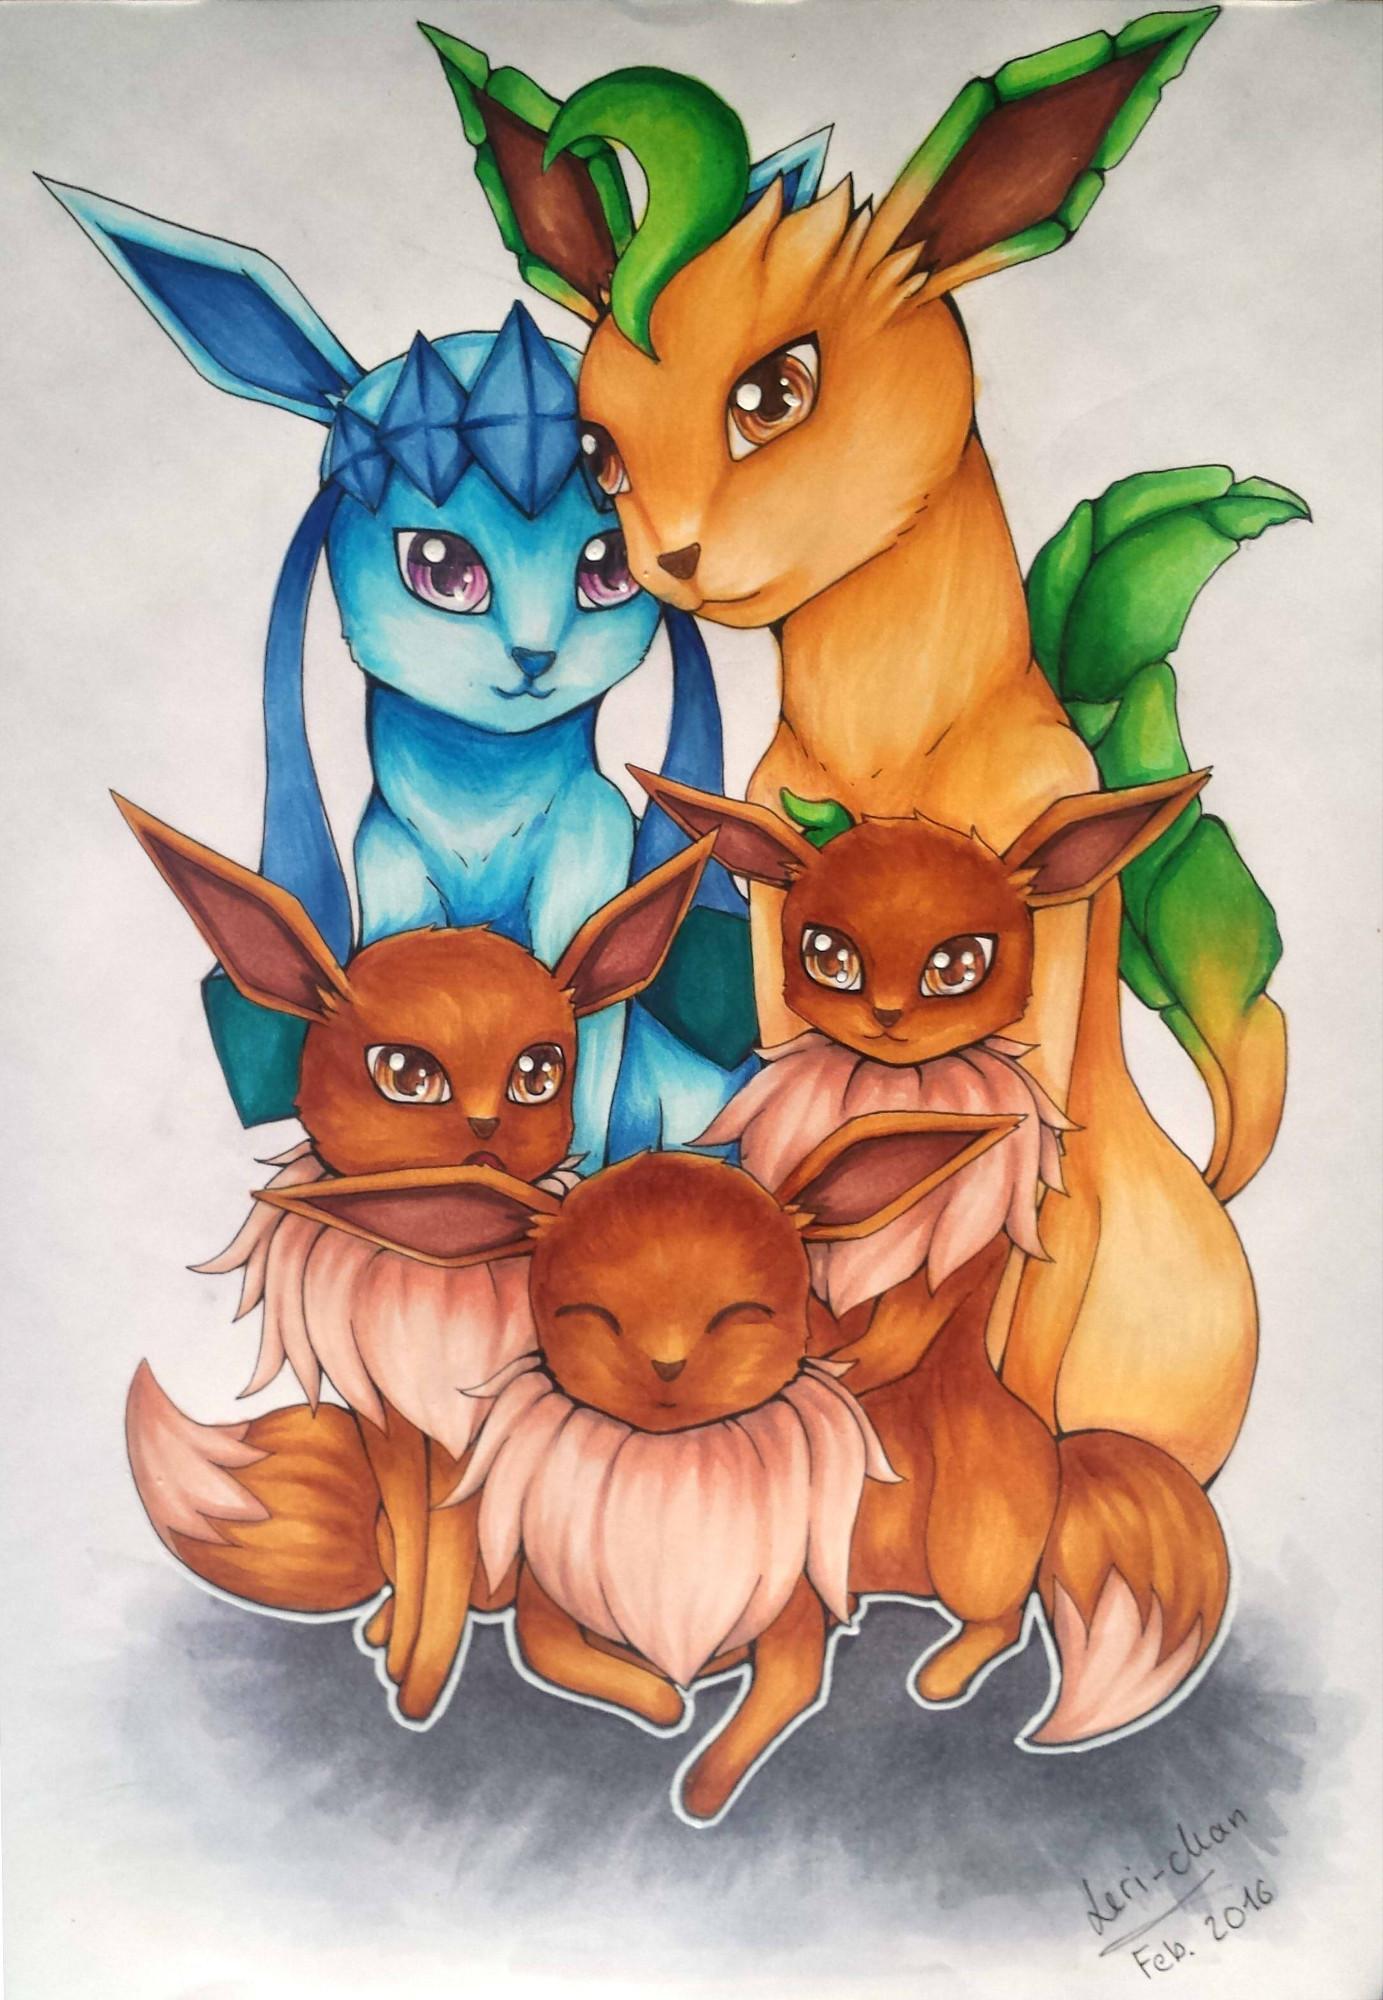 Pokémon-Zeichnung: Family Portrait